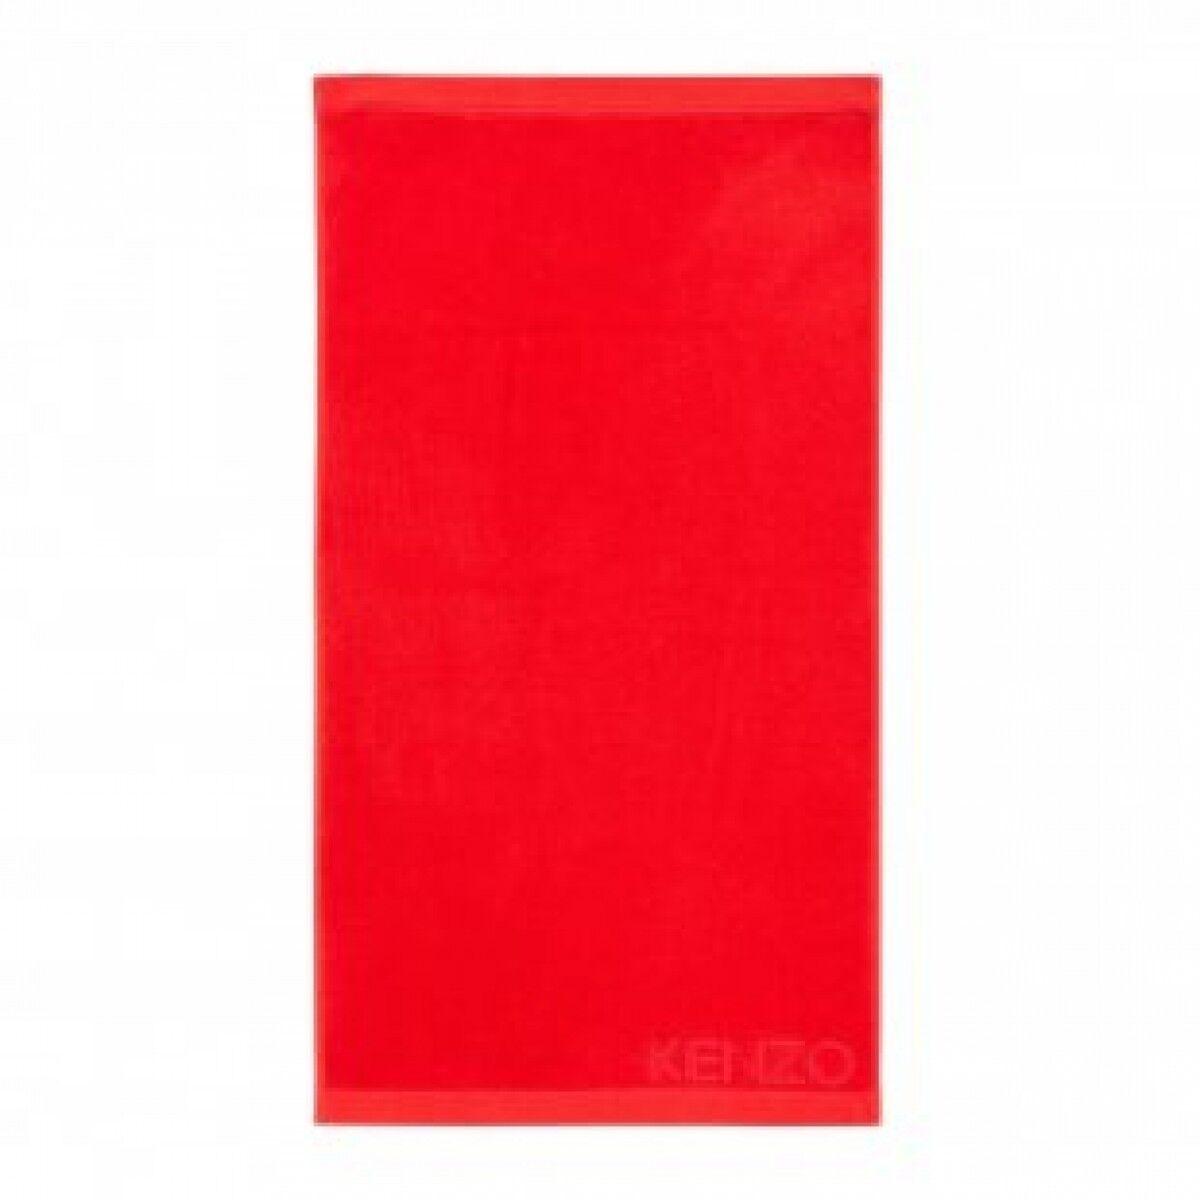 Kenzo Iconic Hand Towel, rot - Set of 4